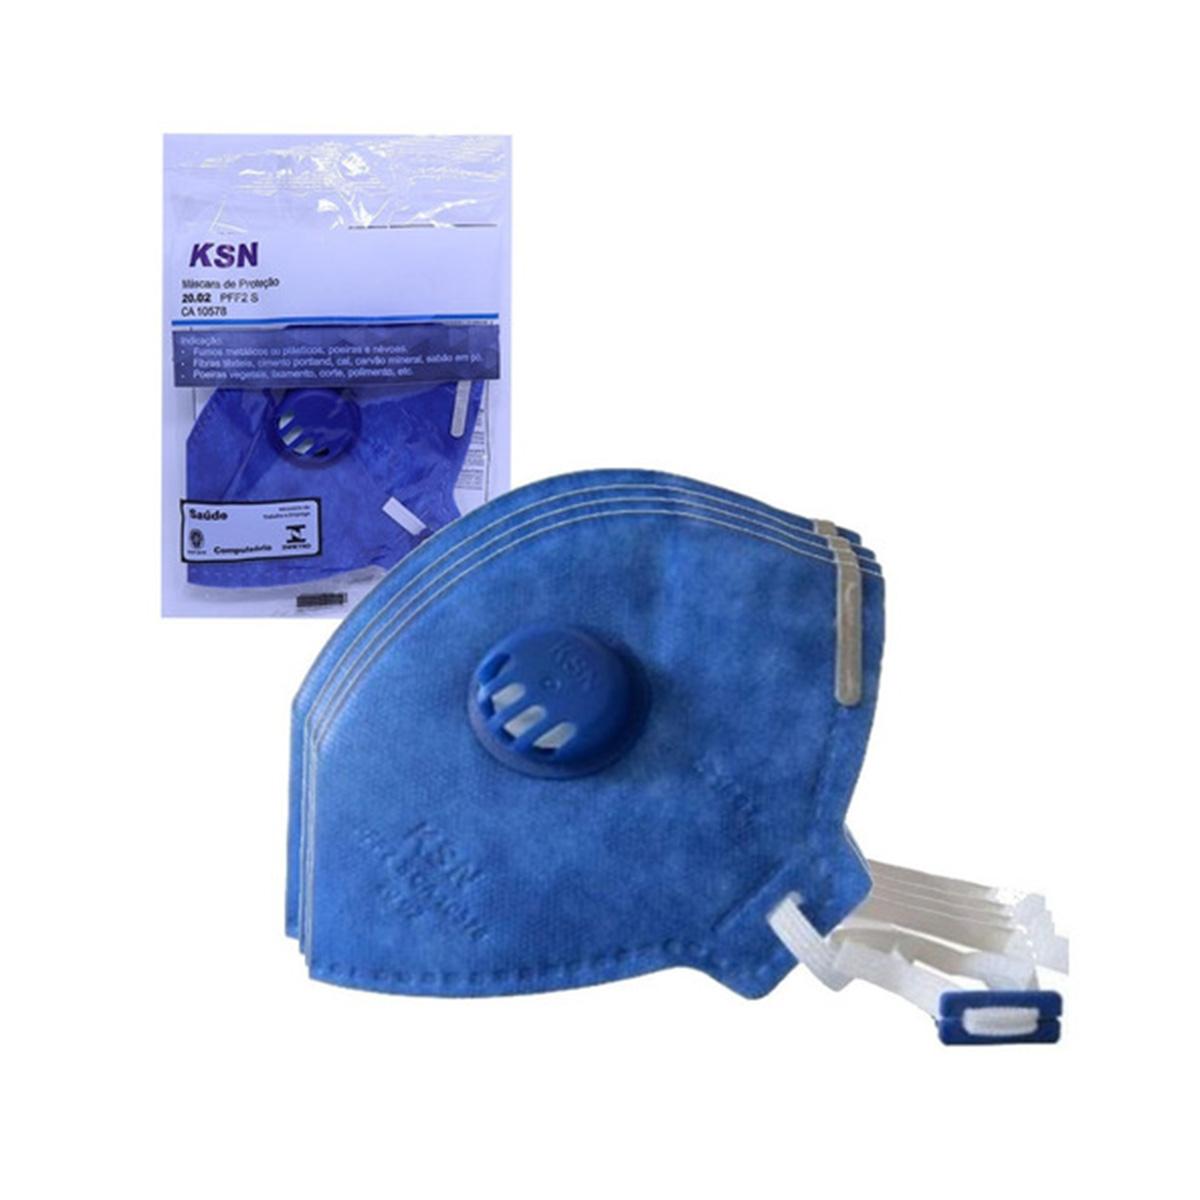 KIT 20 Respirador KSN Descartável Com Válvula  PFF2  CA 10578